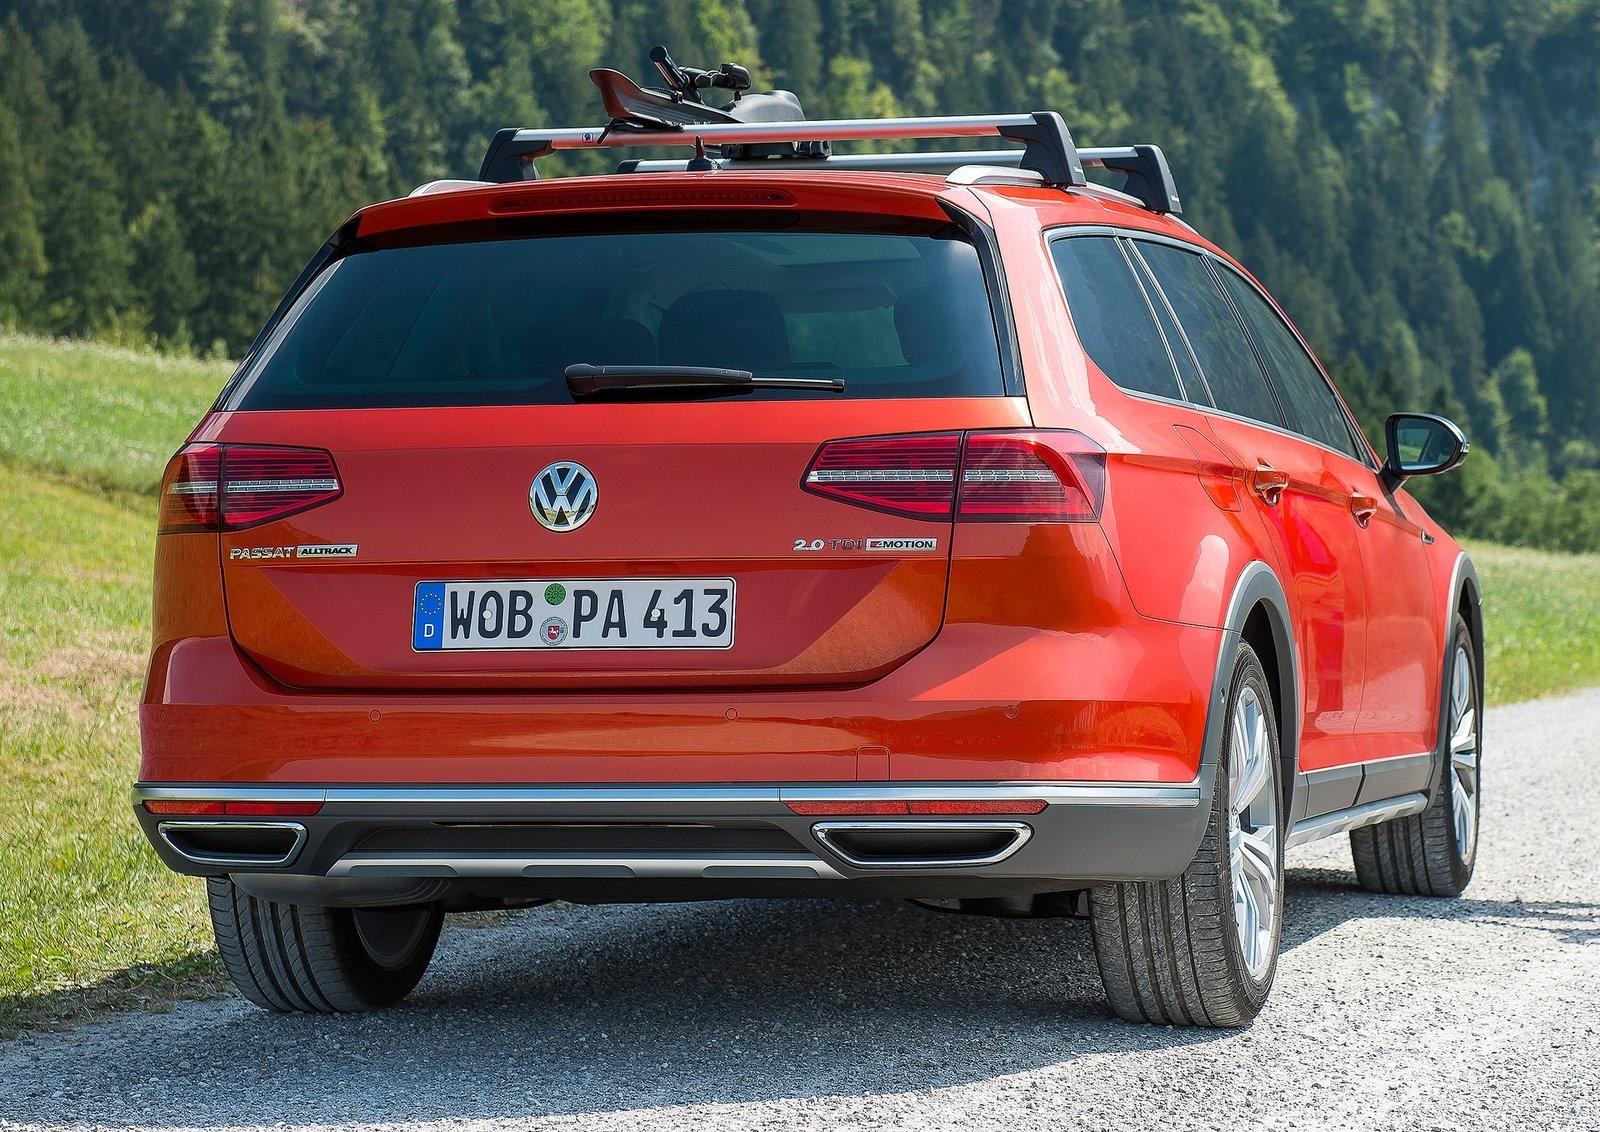 2016 Volkswagen Passat Alltrack Rear Exterior (Photo 13 of 18)